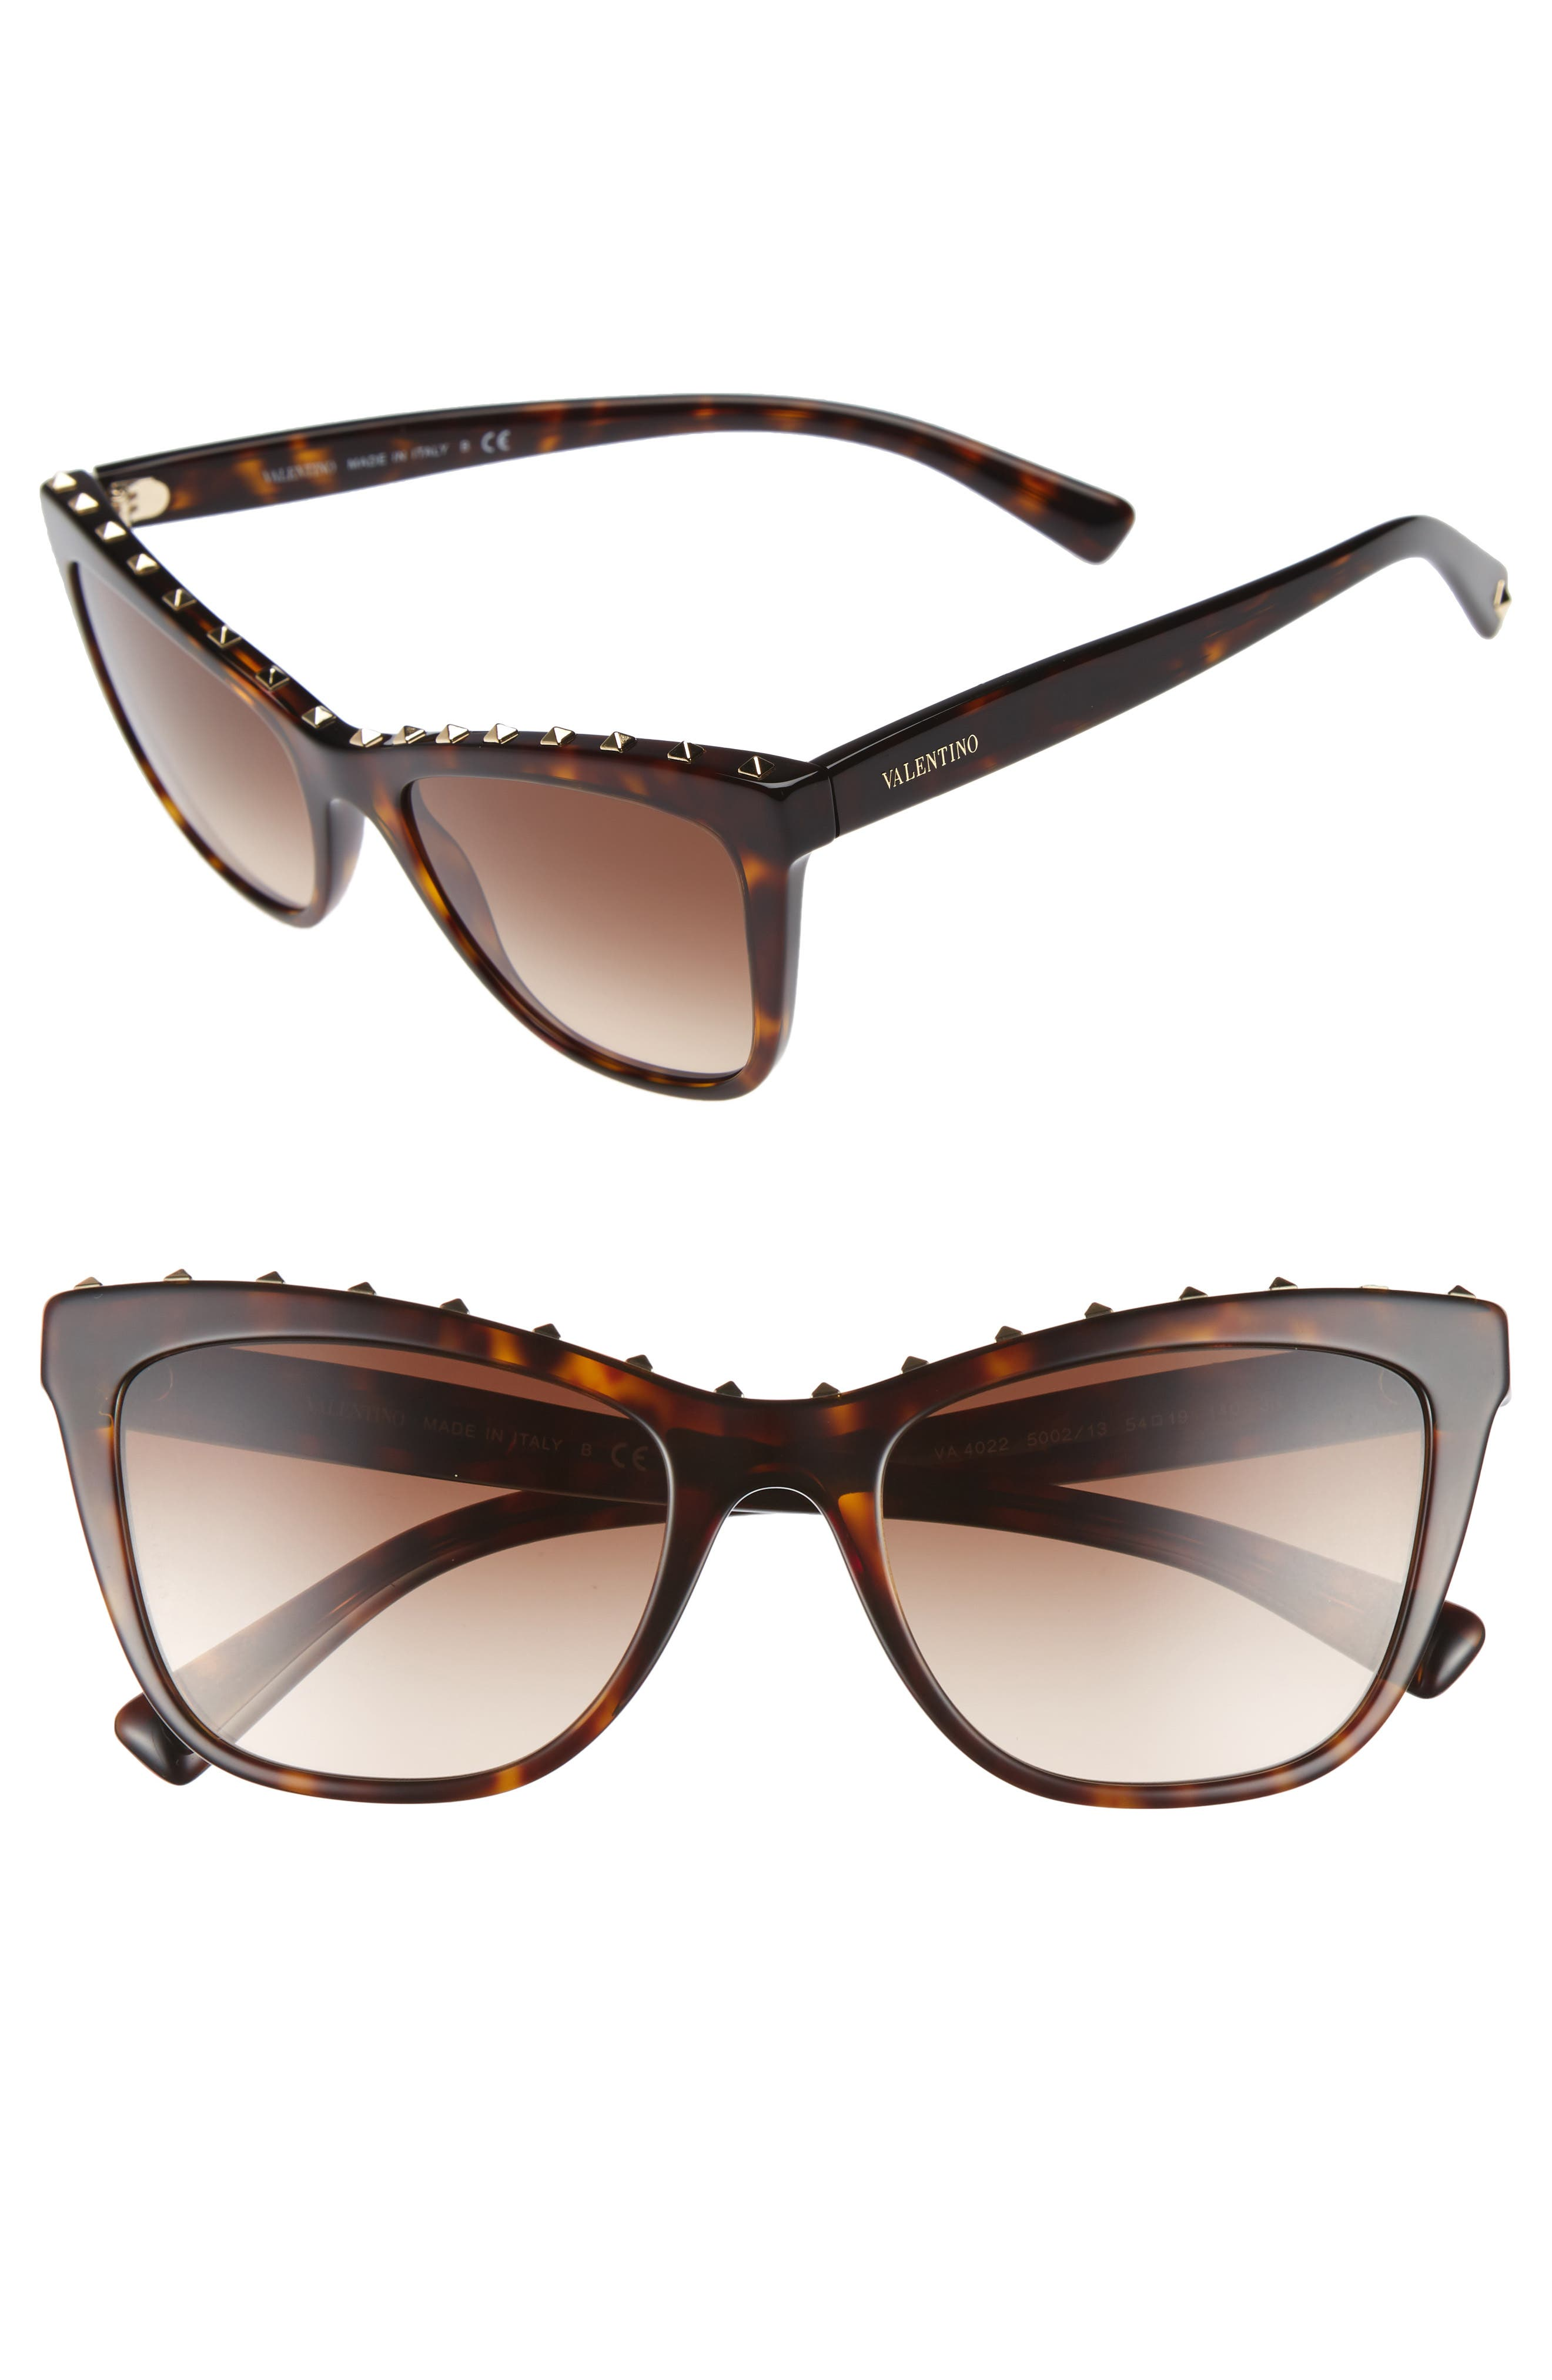 Alternate Image 1 Selected - Valentino Rockstud 54mm Cat Eye Sunglasses